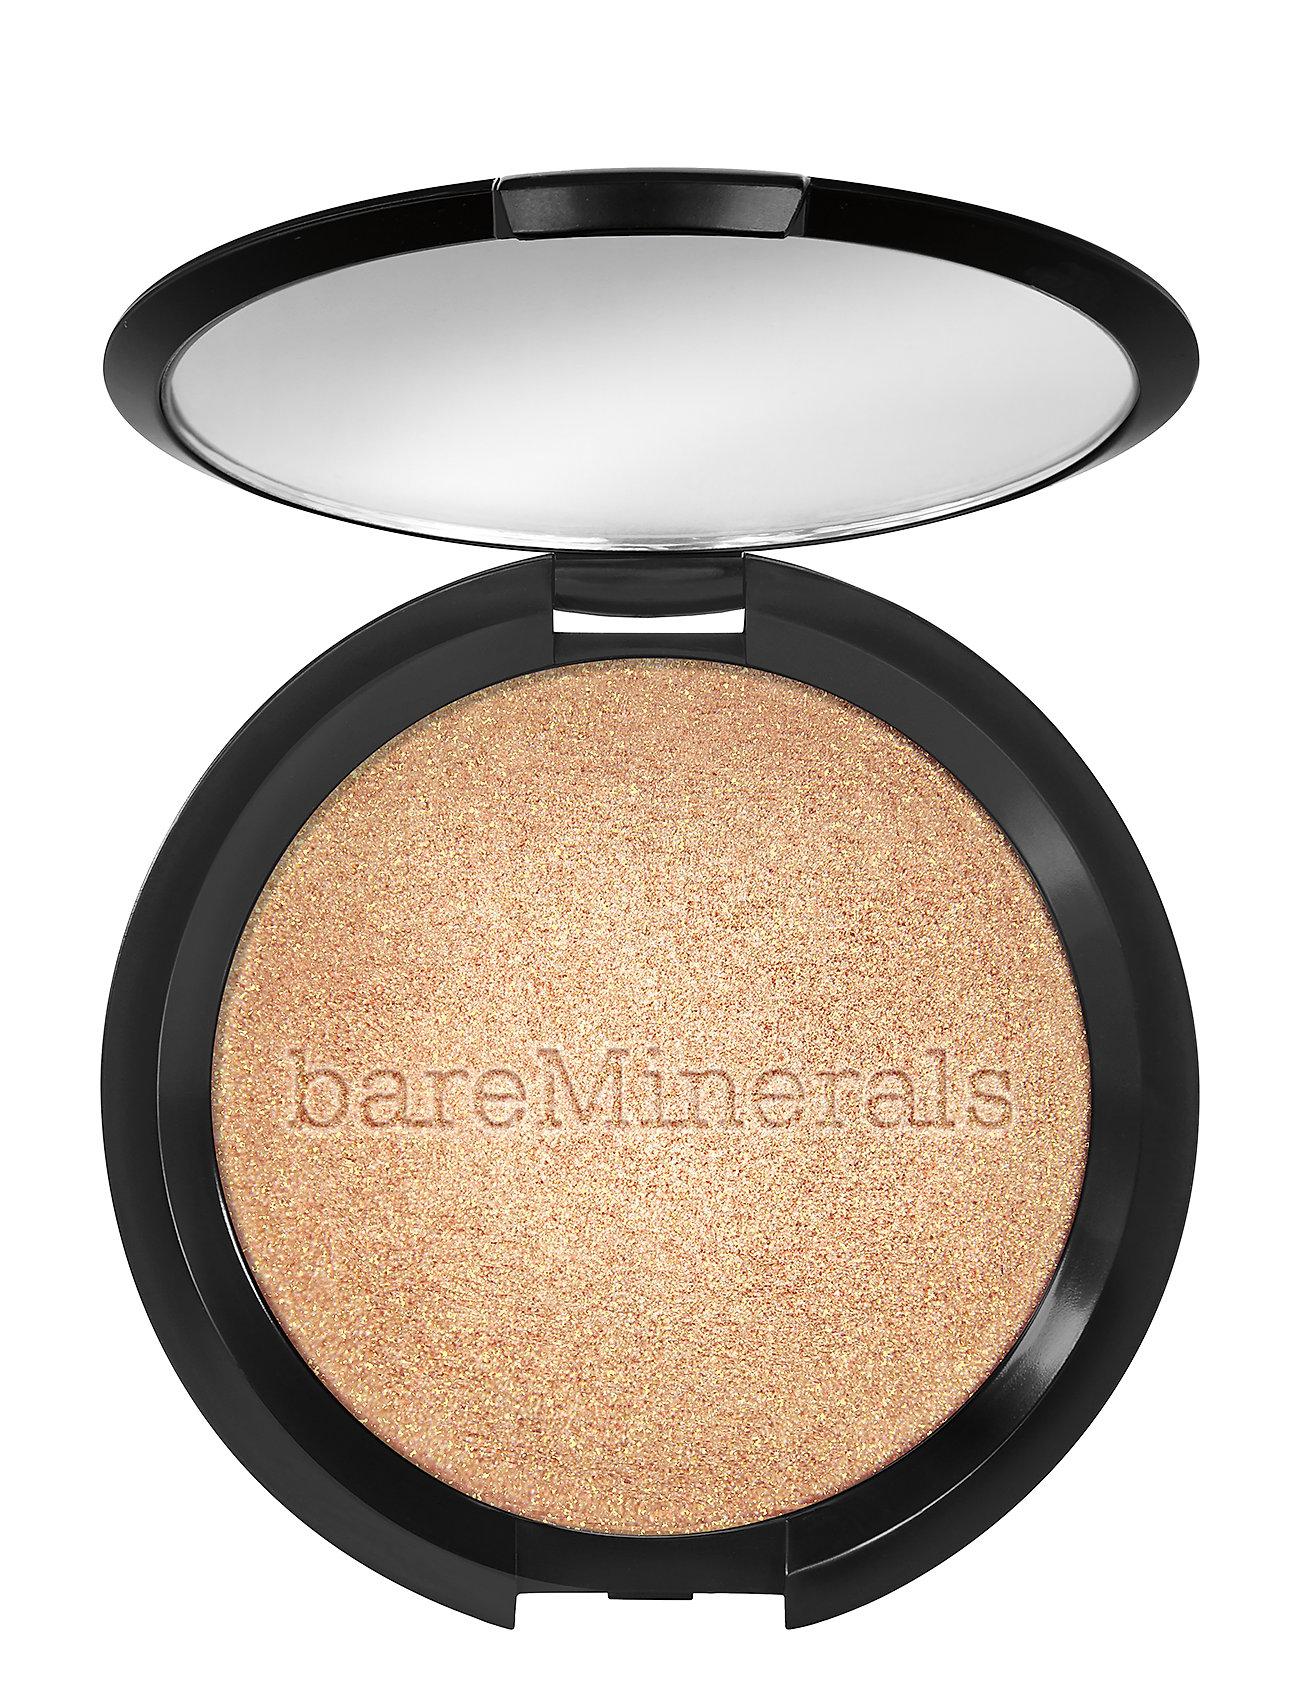 Image of Endless Glow Highlighter Free Highlighter Contour Makeup Multi/mønstret BareMinerals (3210823293)